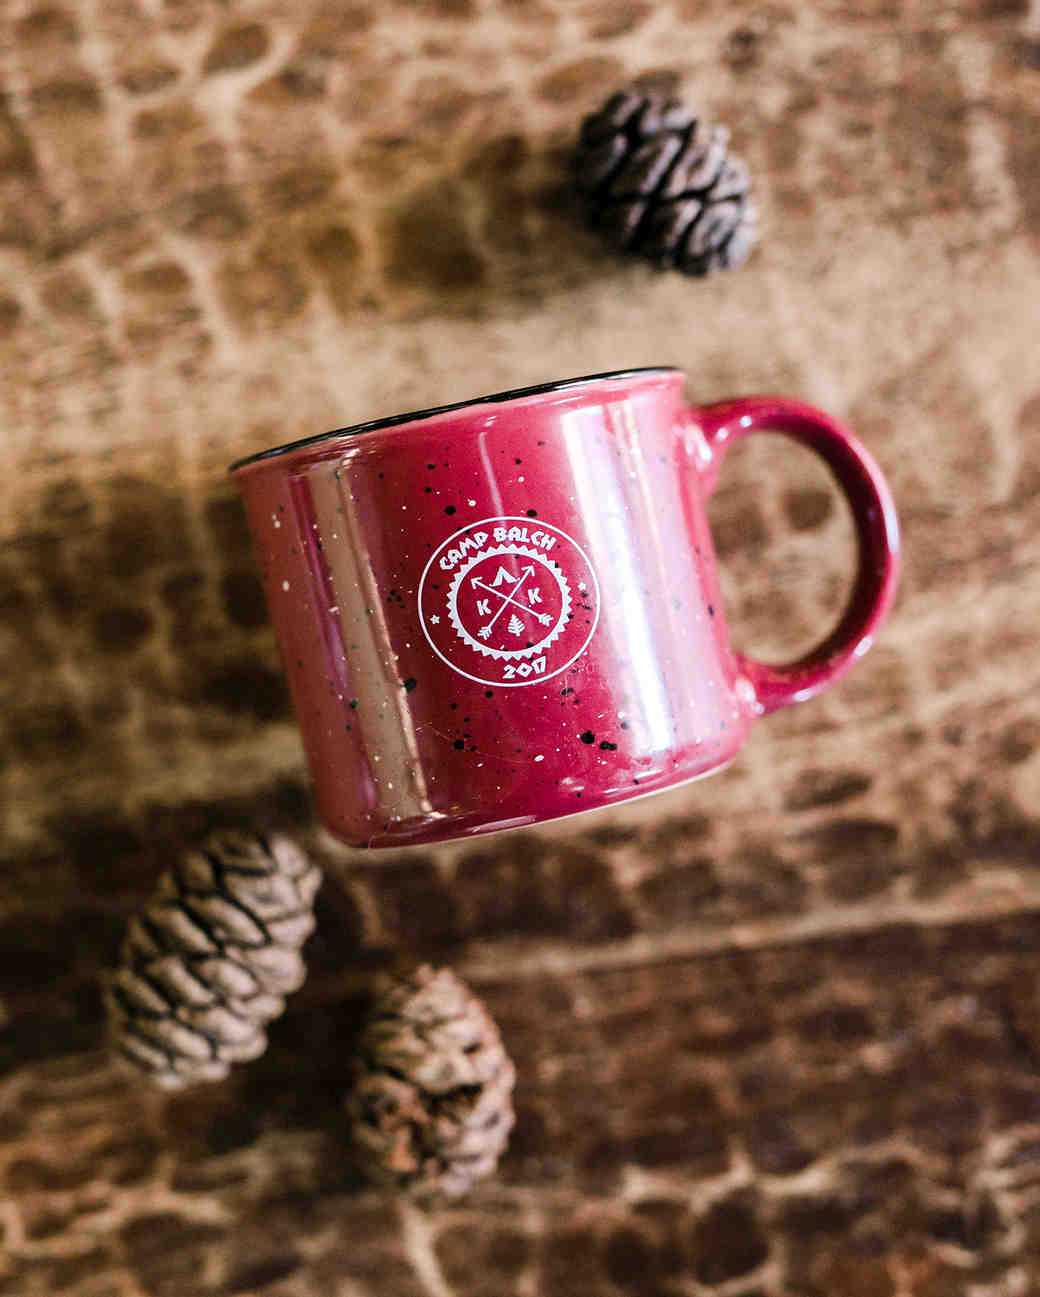 kelly kelsey wedding camp mugs